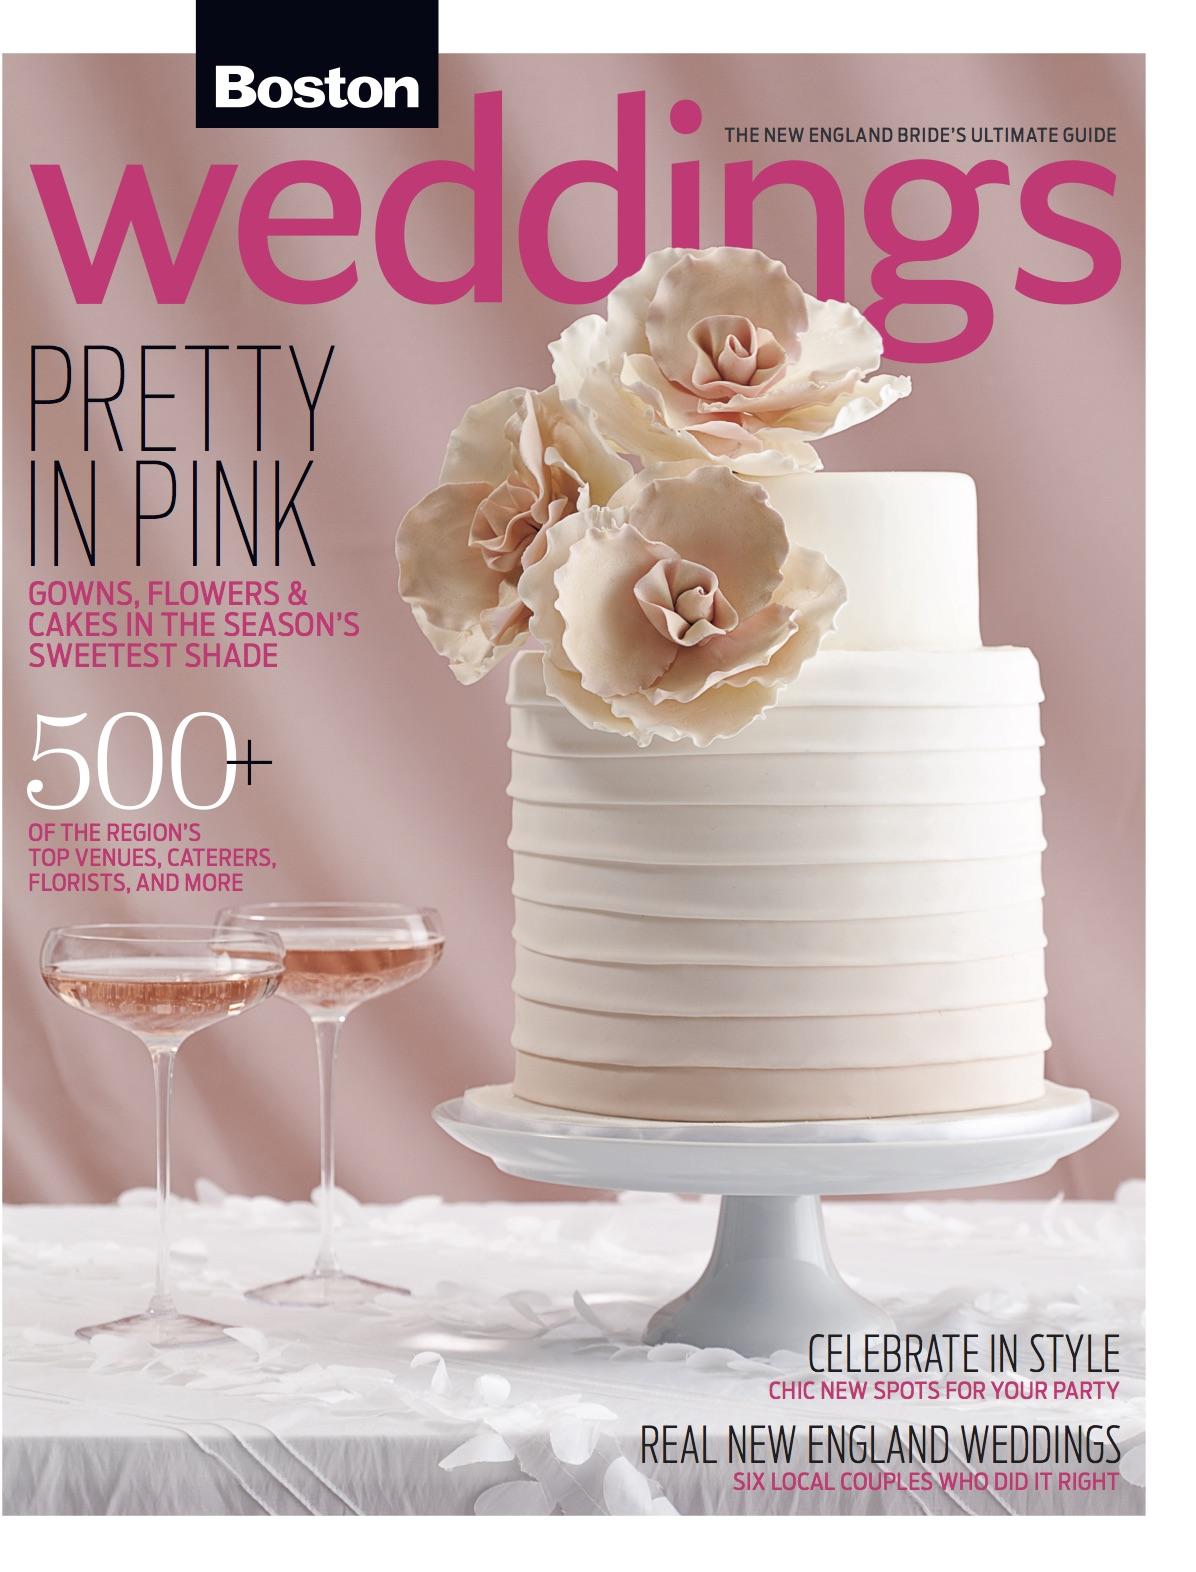 weddings_2012_fw_cover.jpg